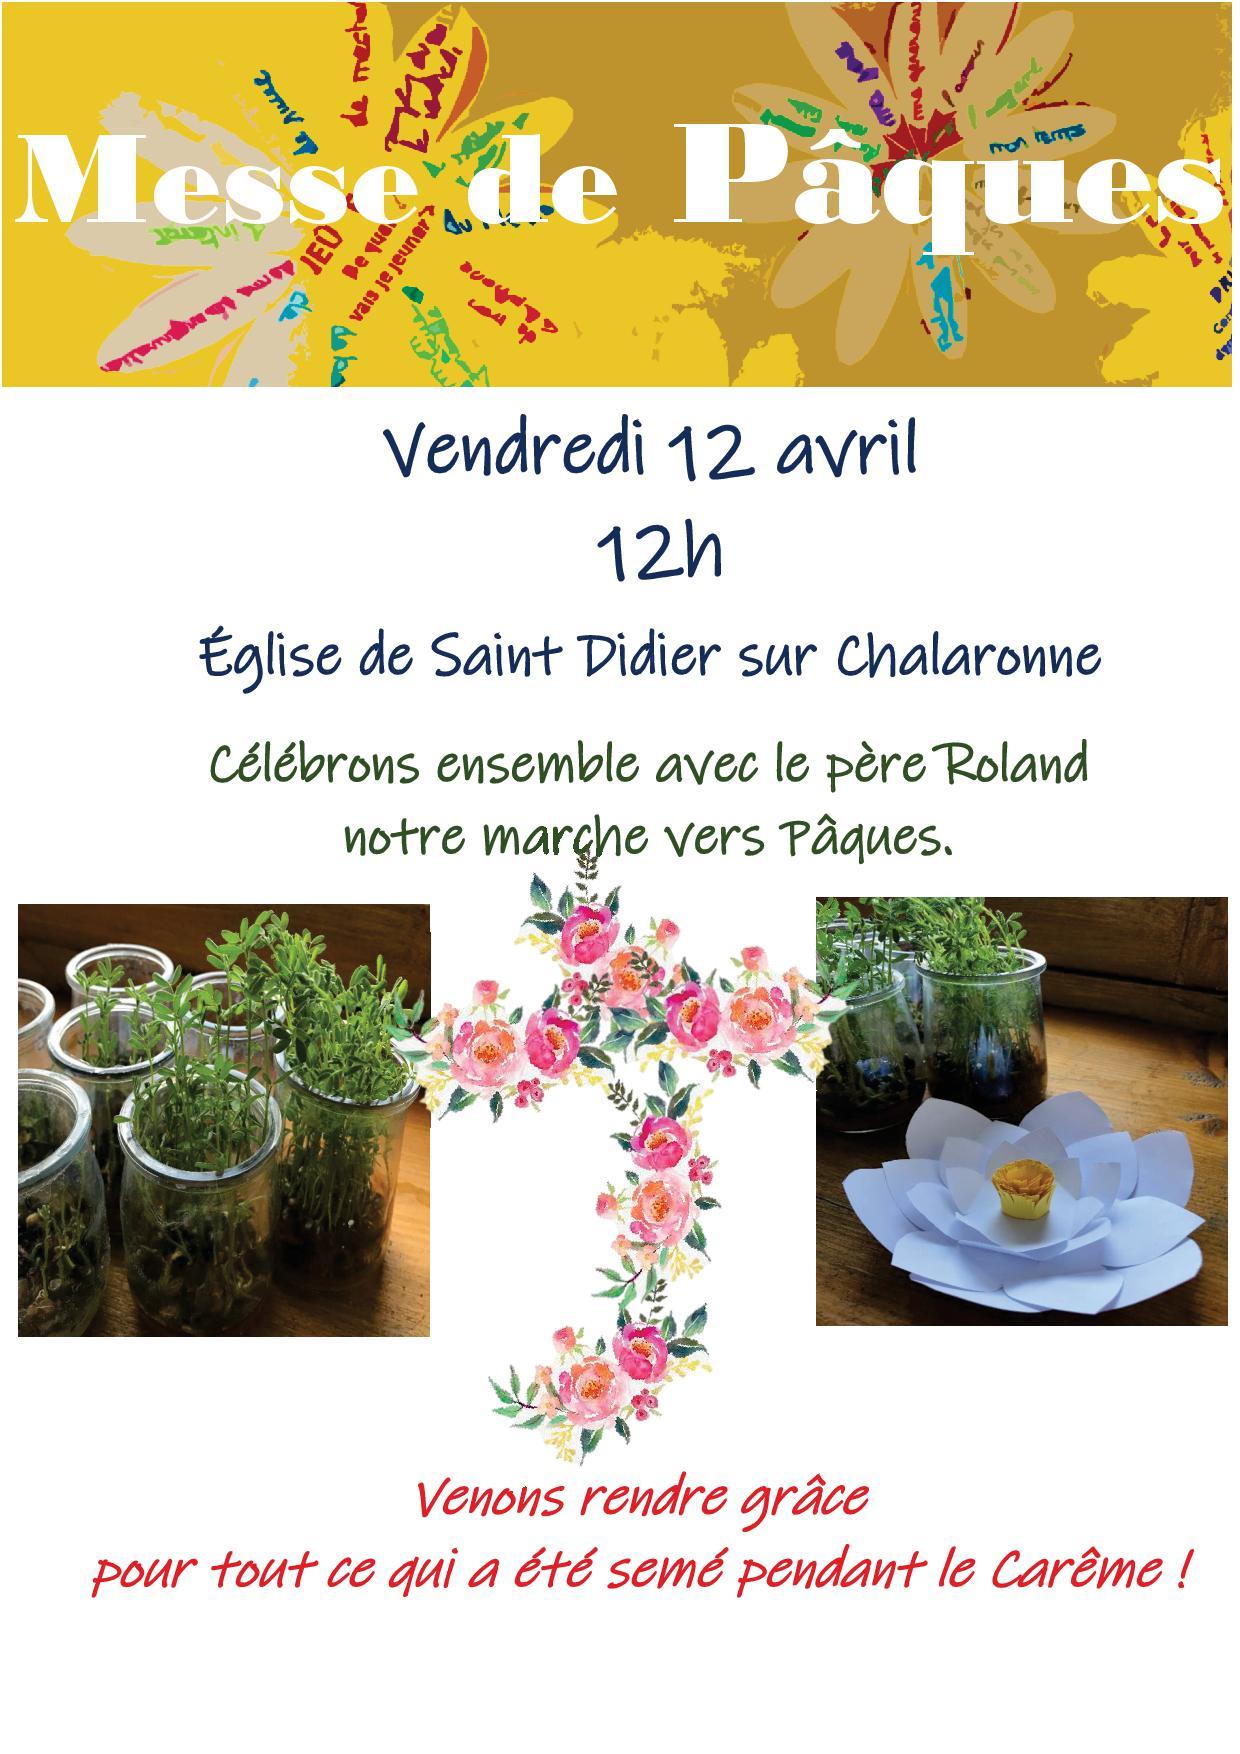 Messe De Pâques Vendredi 12 Avril 12h00